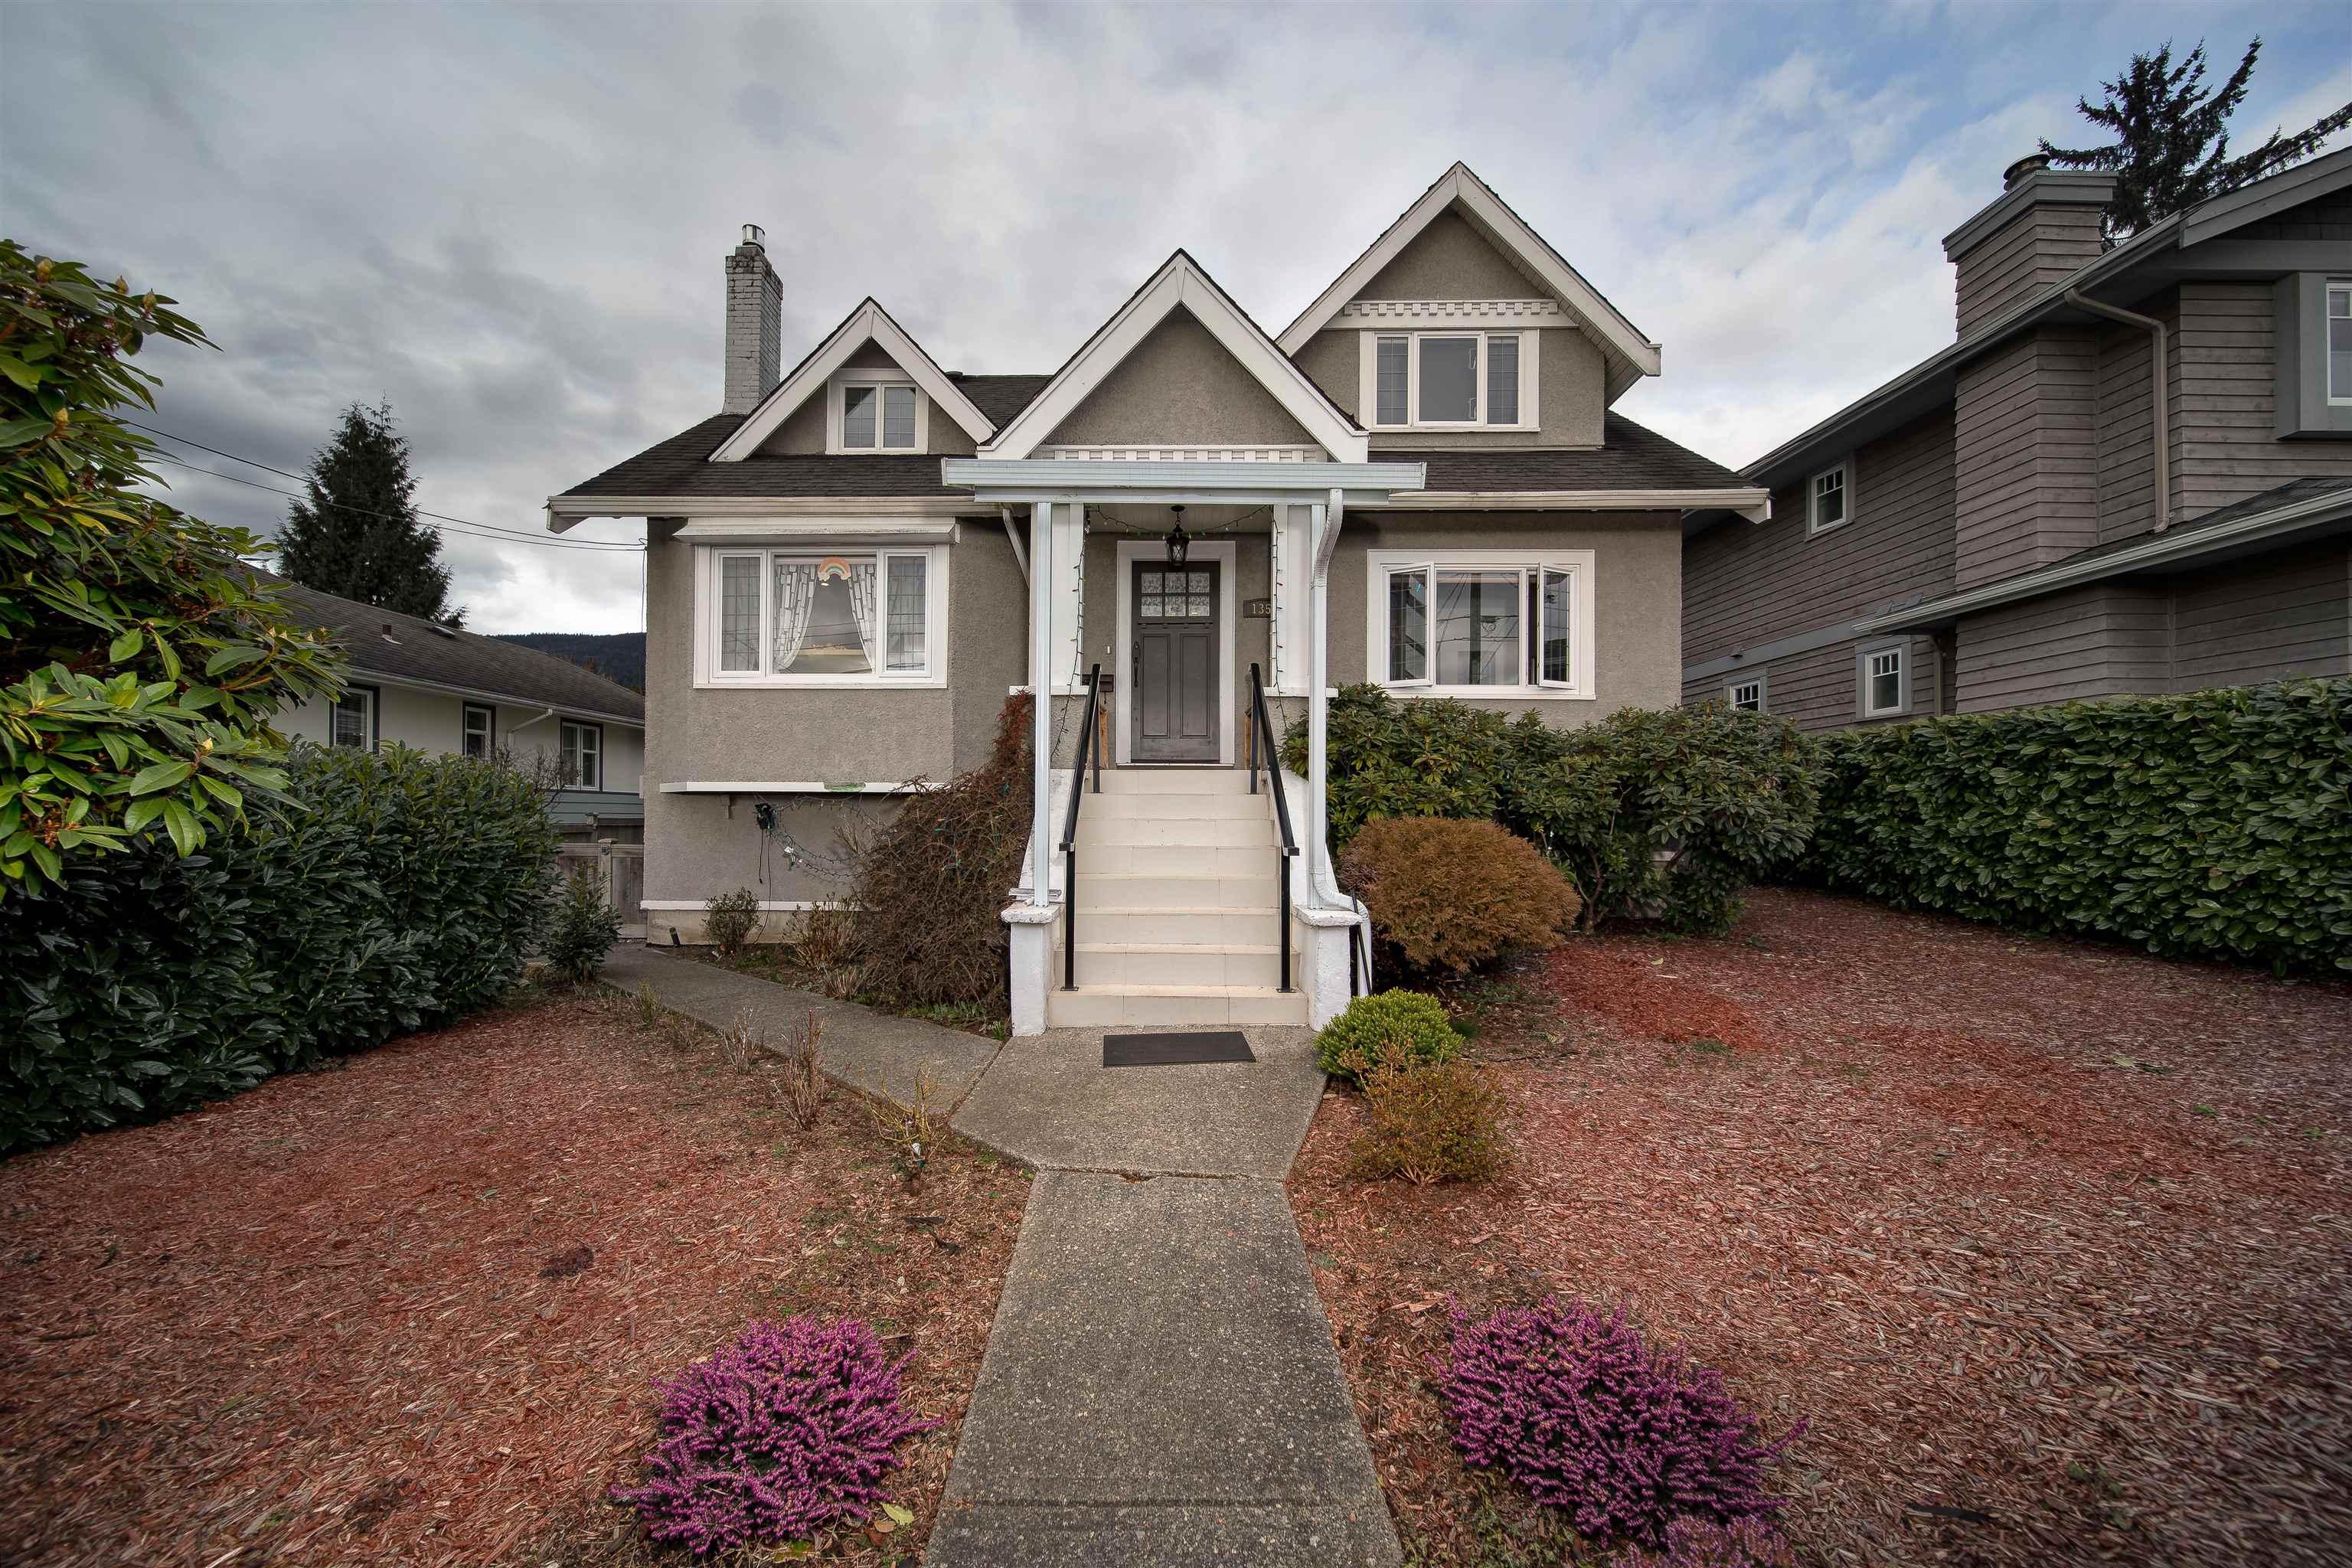 1357 FULTON AVENUE - Ambleside House/Single Family for sale, 6 Bedrooms (R2617731) - #1